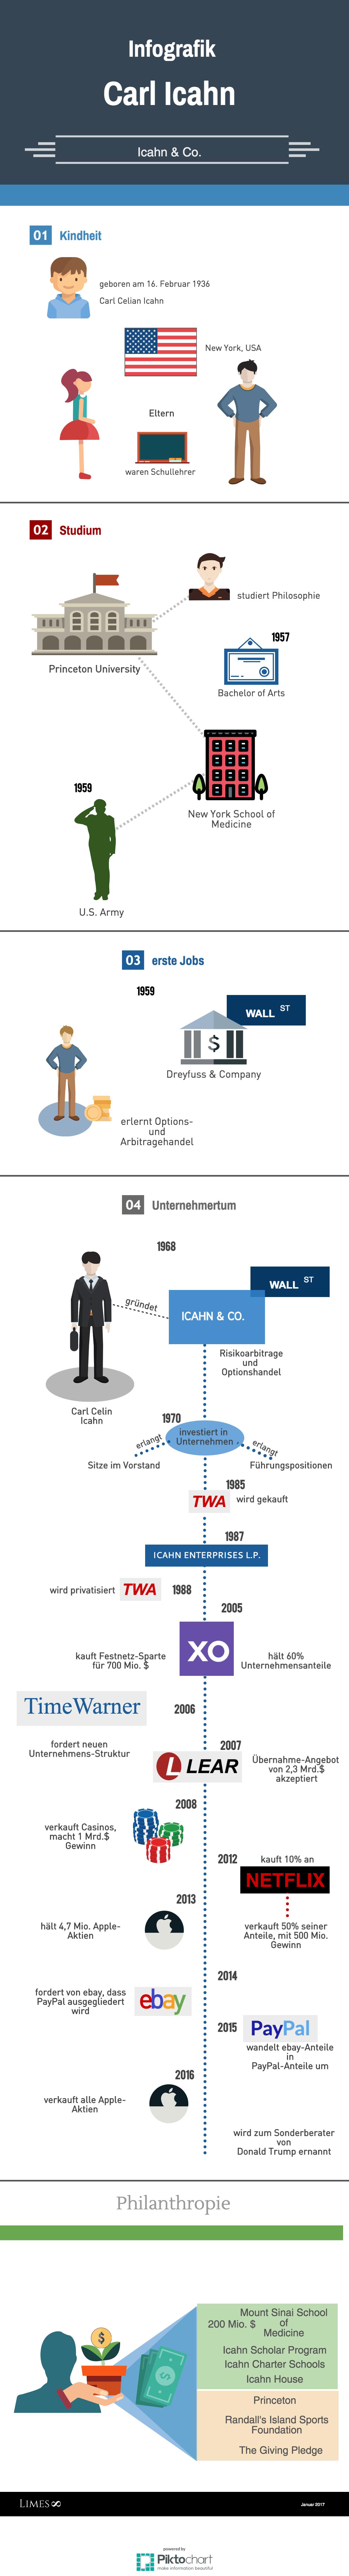 Informationsgrafik des Milliardärs Carl Icahn